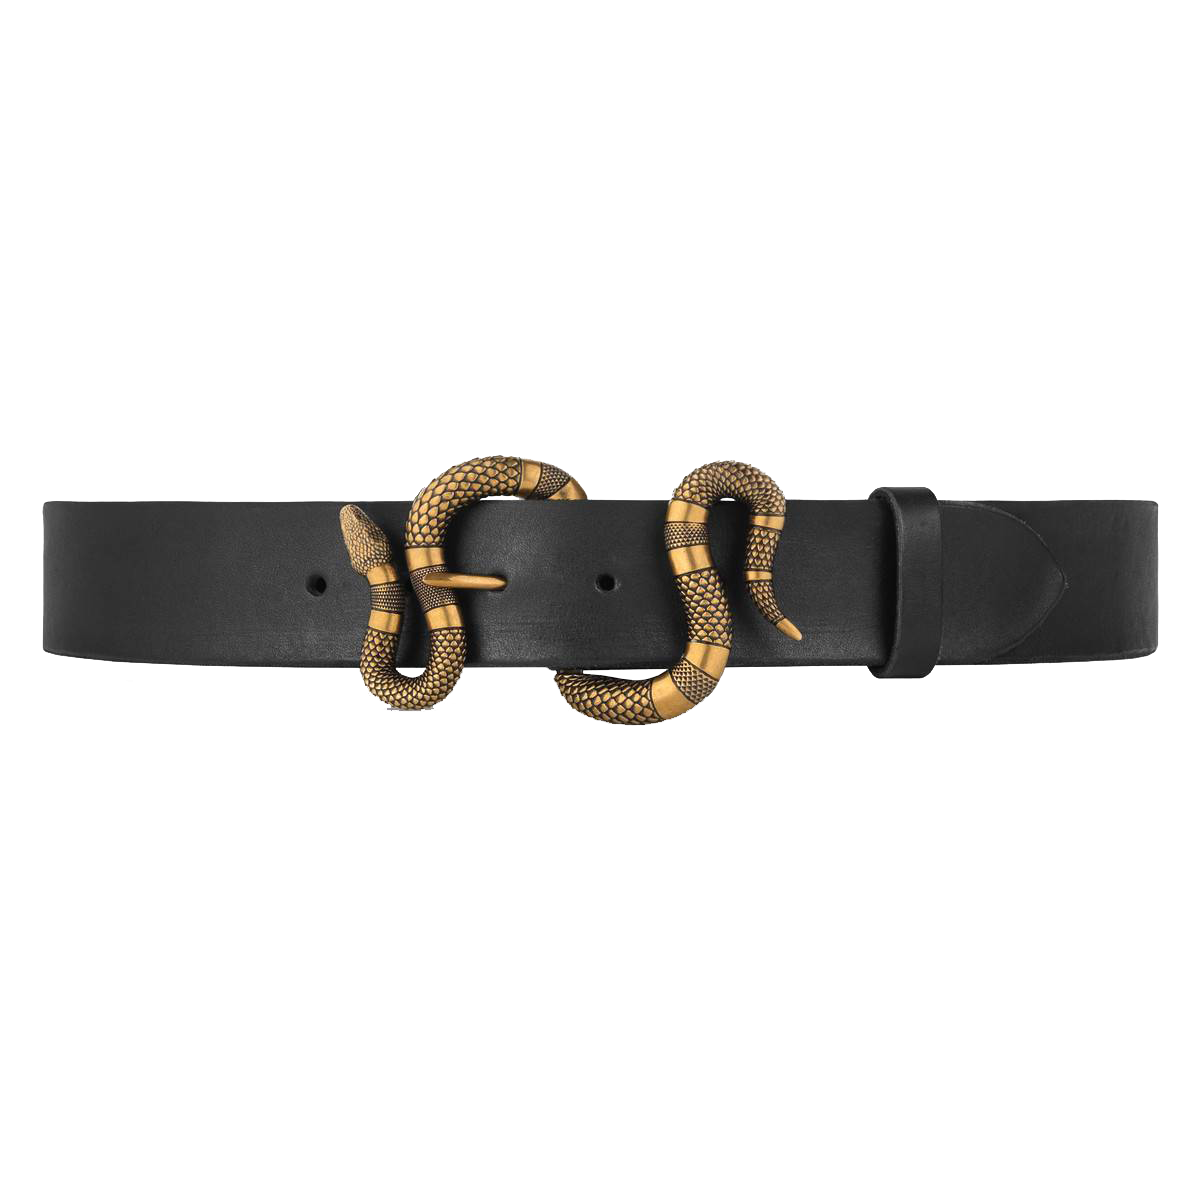 458935_CVE0T_1000_001_100_0000_Light-Leather-belt-with-snake-buckle.png